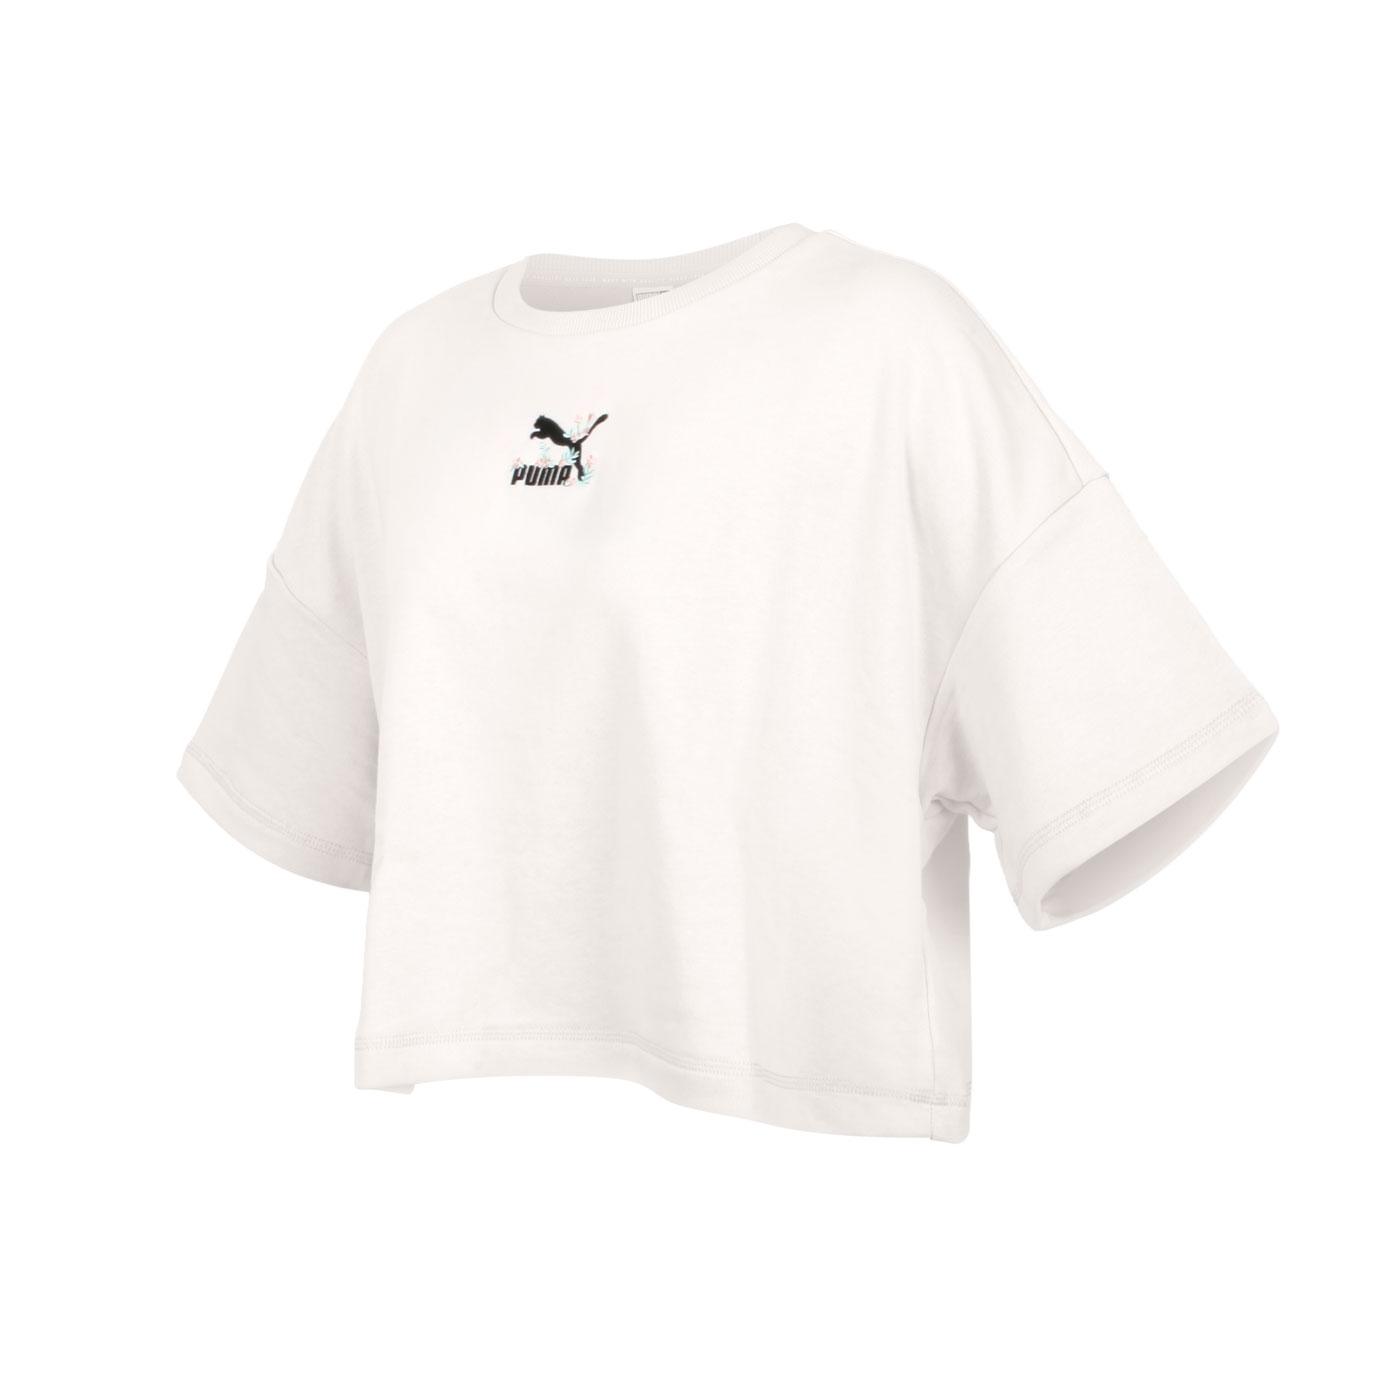 PUMA 女款流行系列Floral短袖T恤 53313173 - 米白黑粉綠